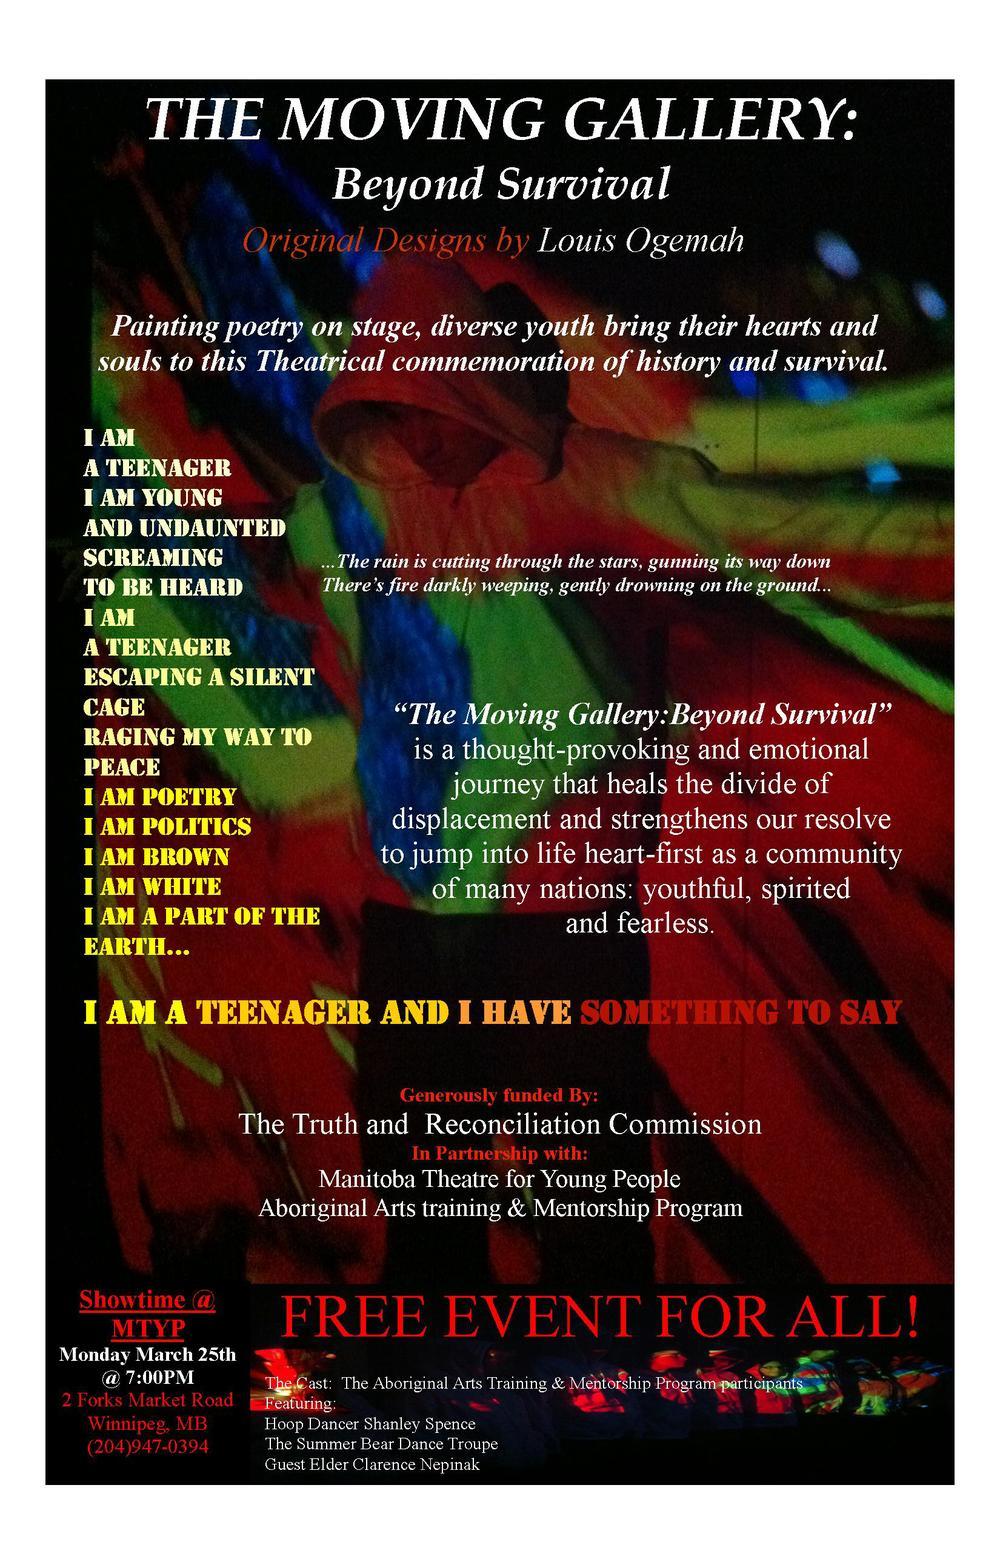 Moving Gallery TRC poster 2013 - Ryan Edit 2.jpg